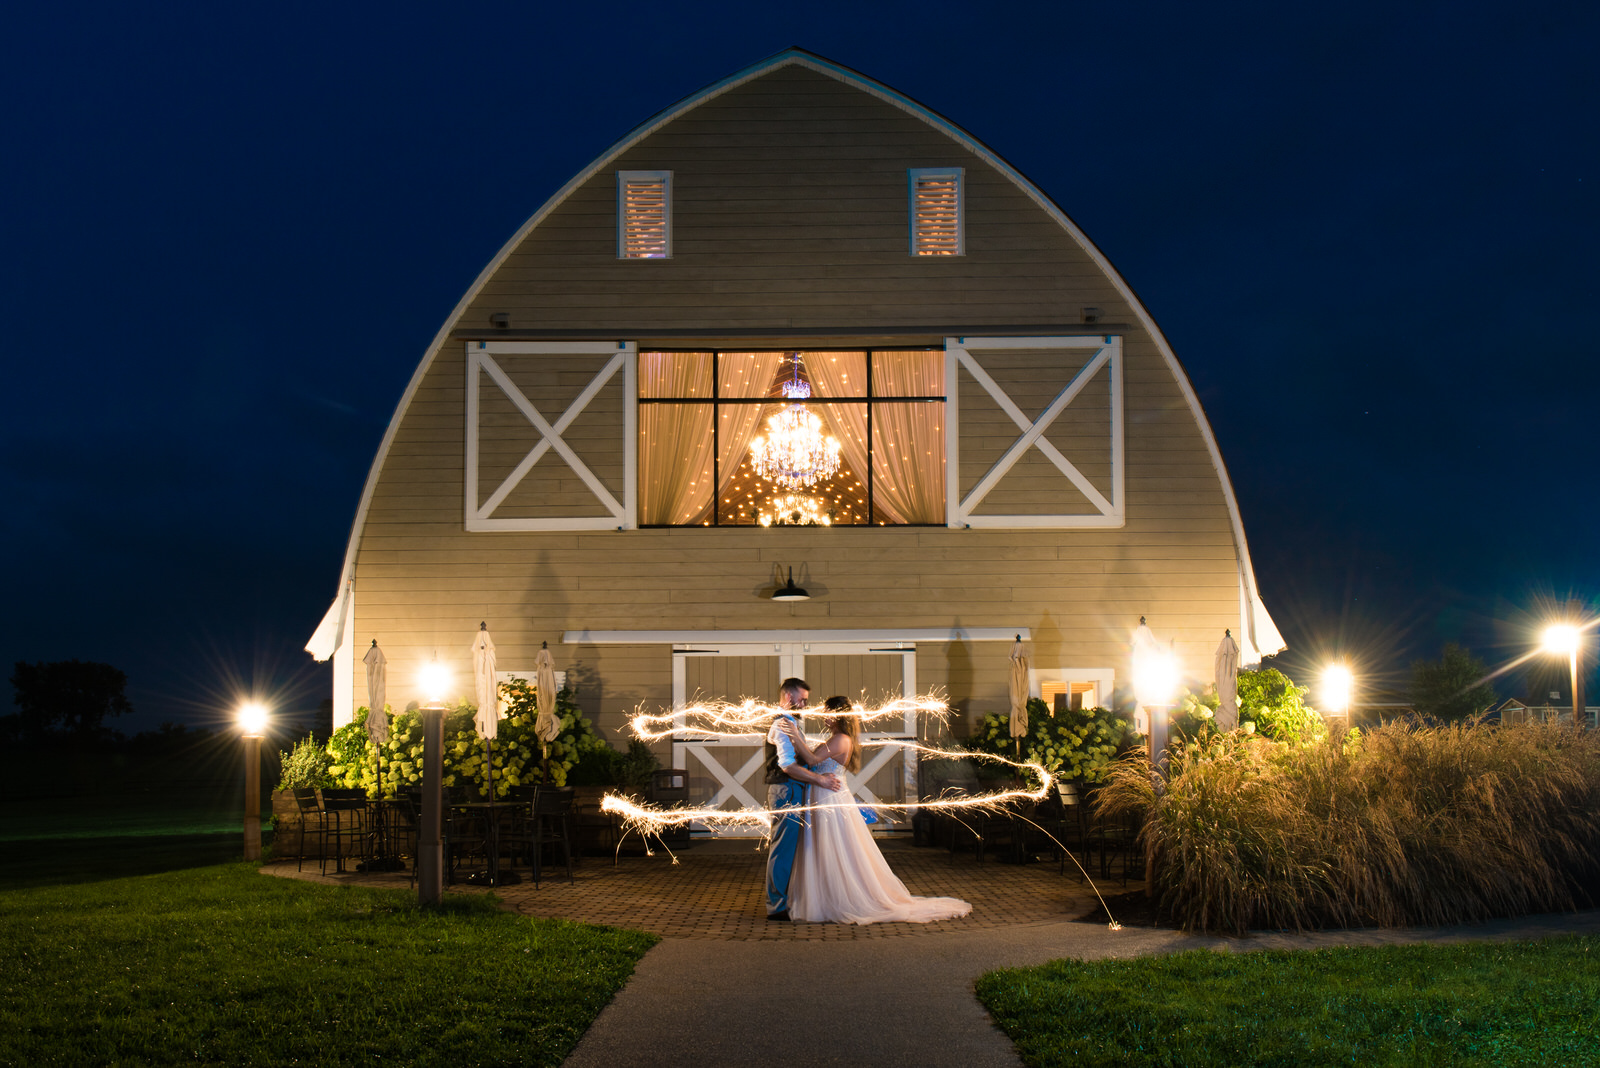 Shakespeare-restaurant-and-pub-pa-wedding-6.jpg